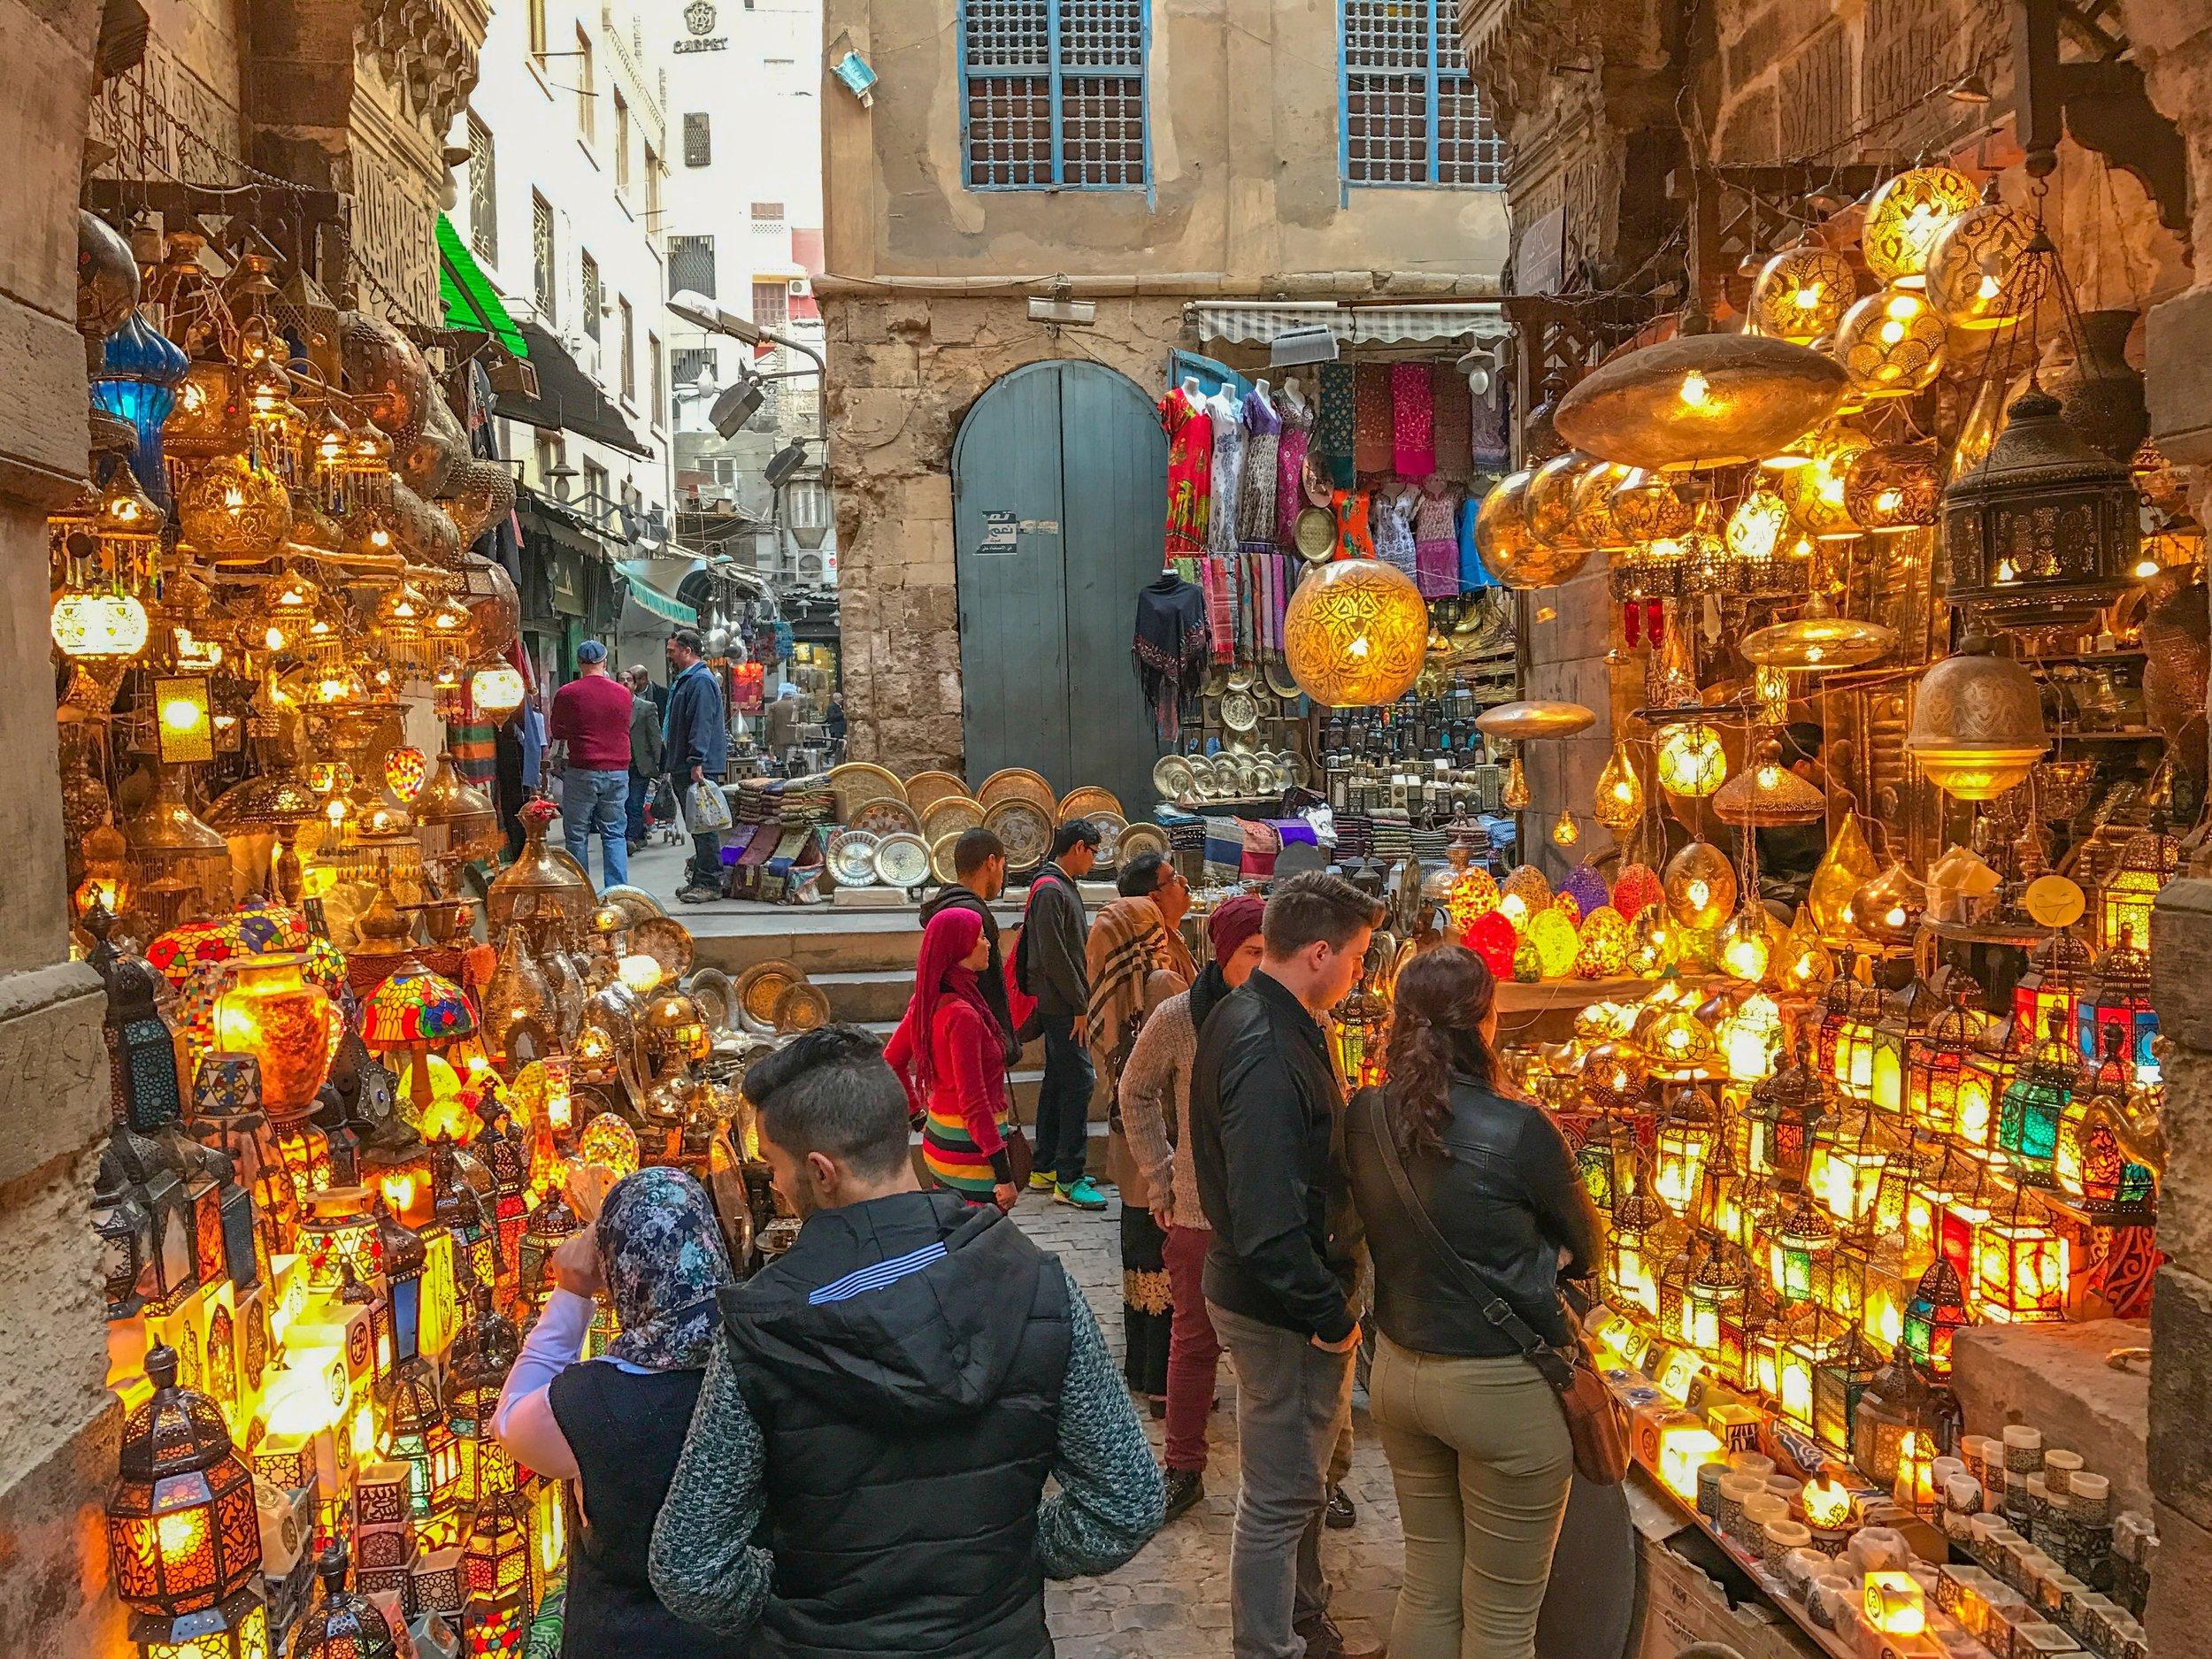 Khan al Khalili shopping bazzar